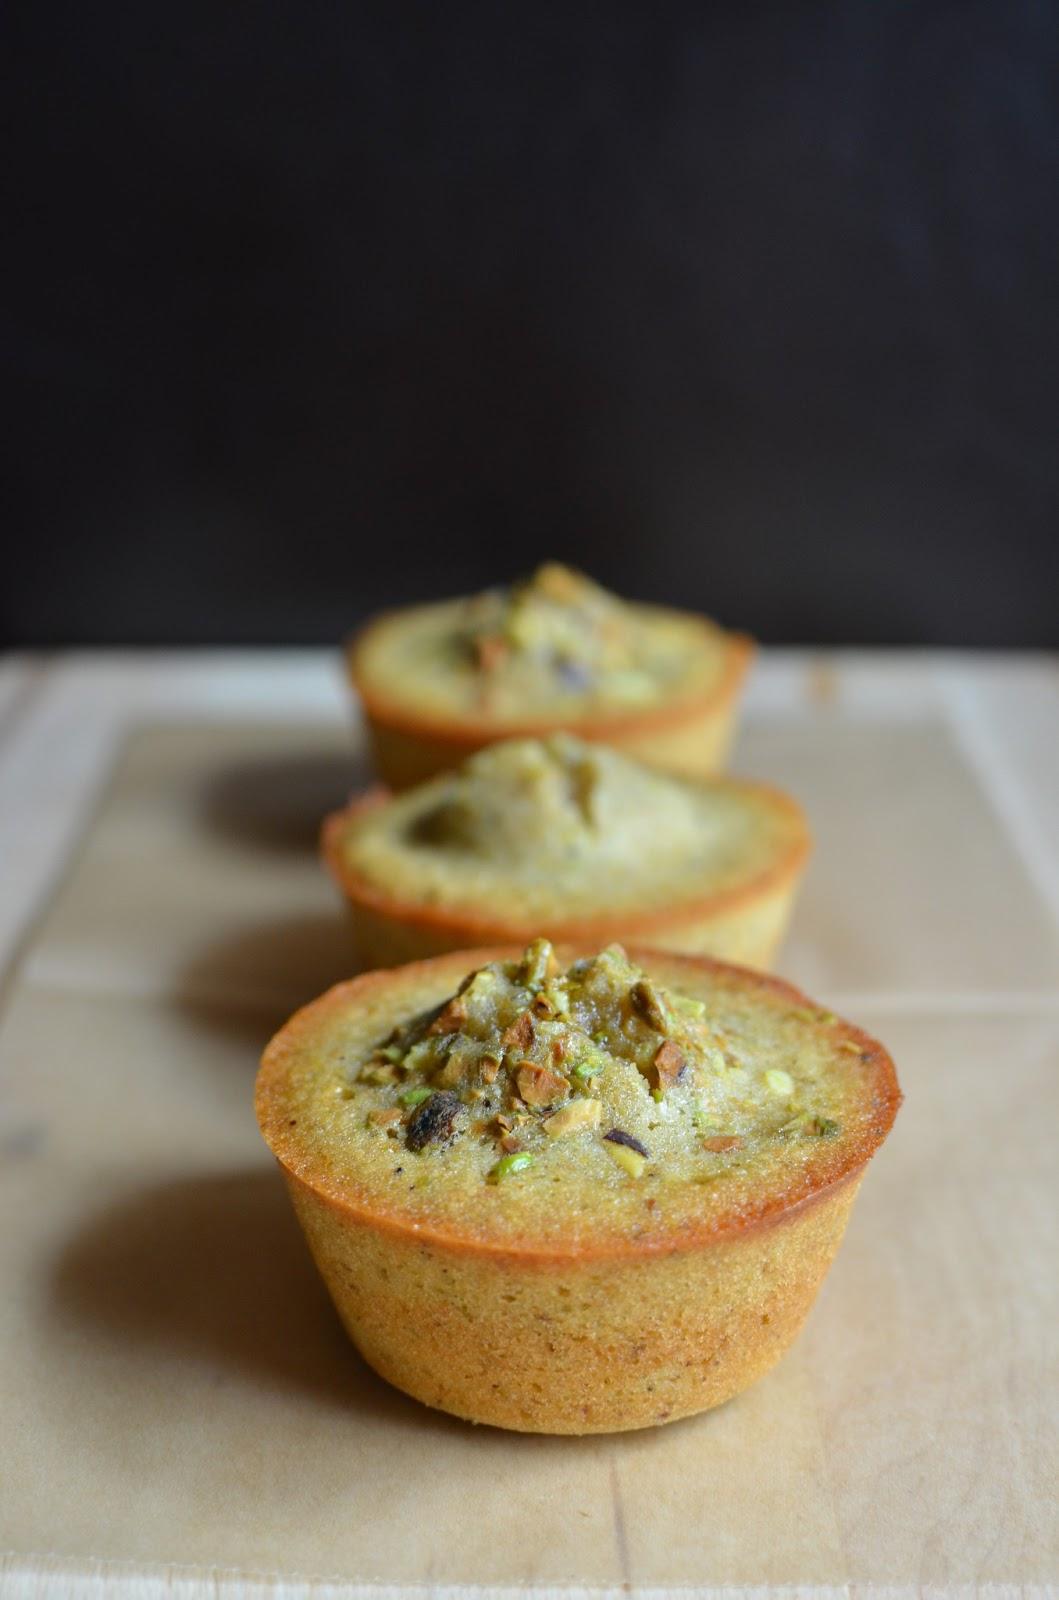 Pistachio Muffin Recipe With Cake Mix